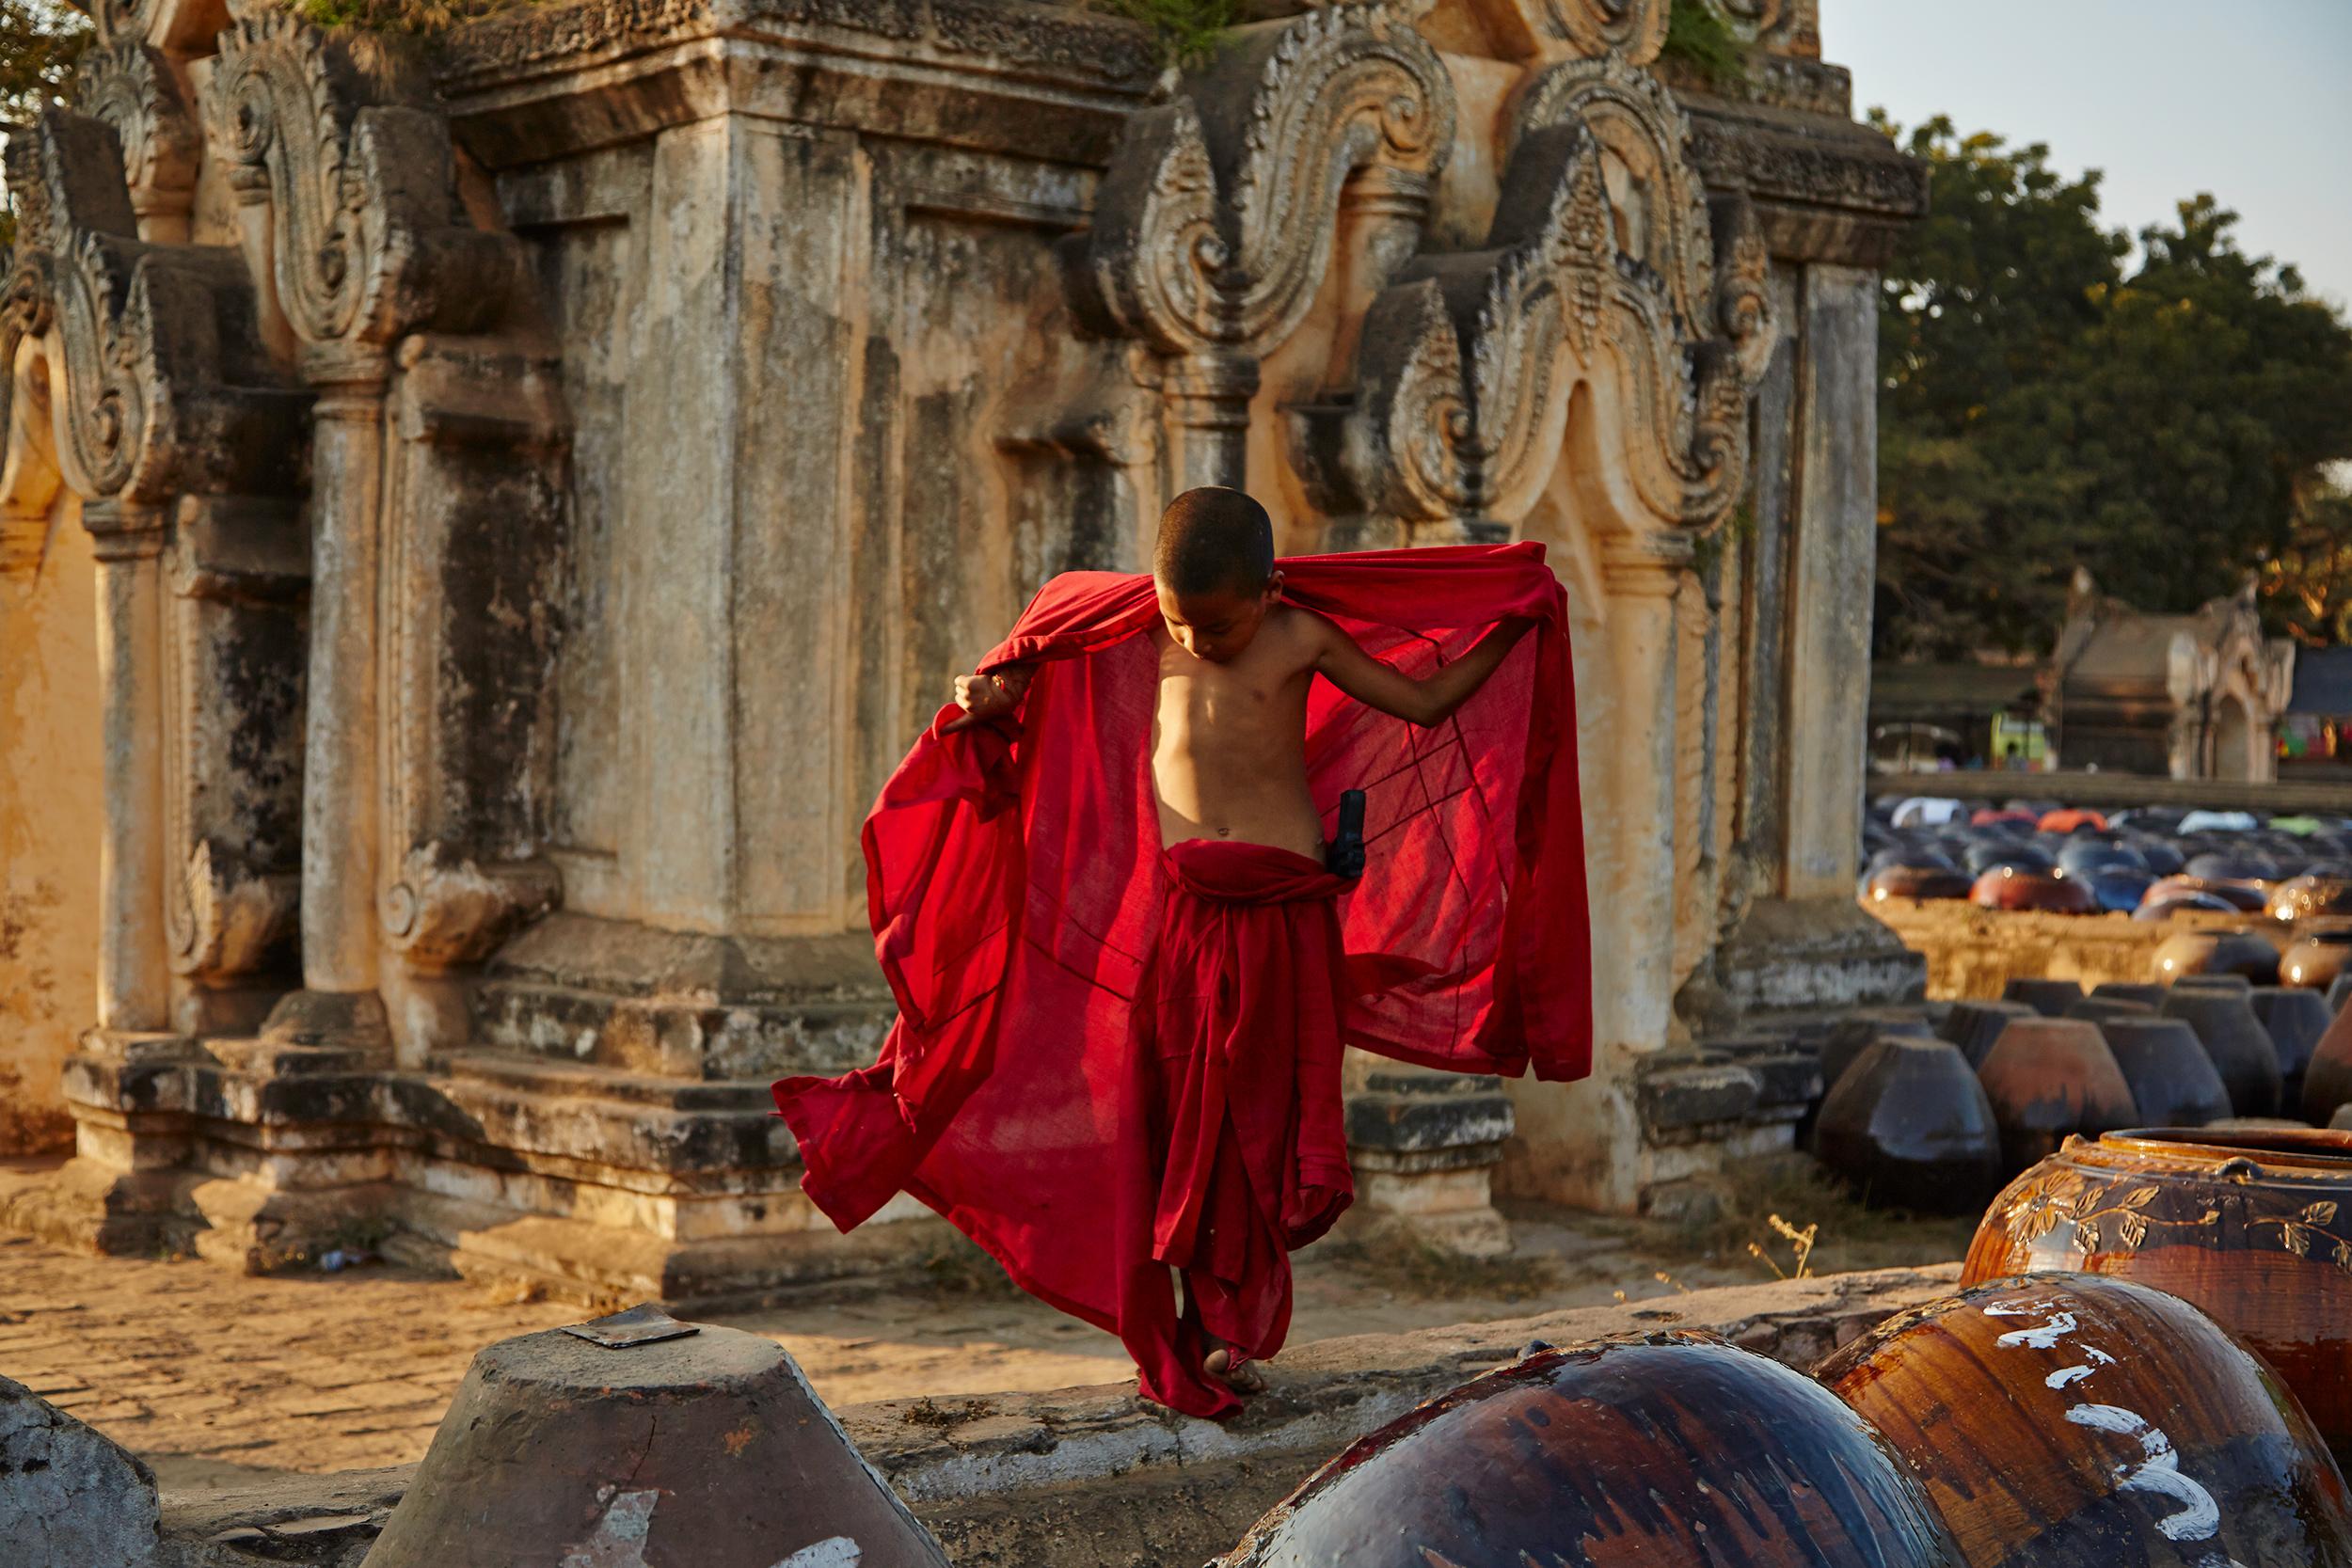 Kanjana-Chaiwatanachai-Image-Works_Bagan_2014.01.14_0323w.jpg